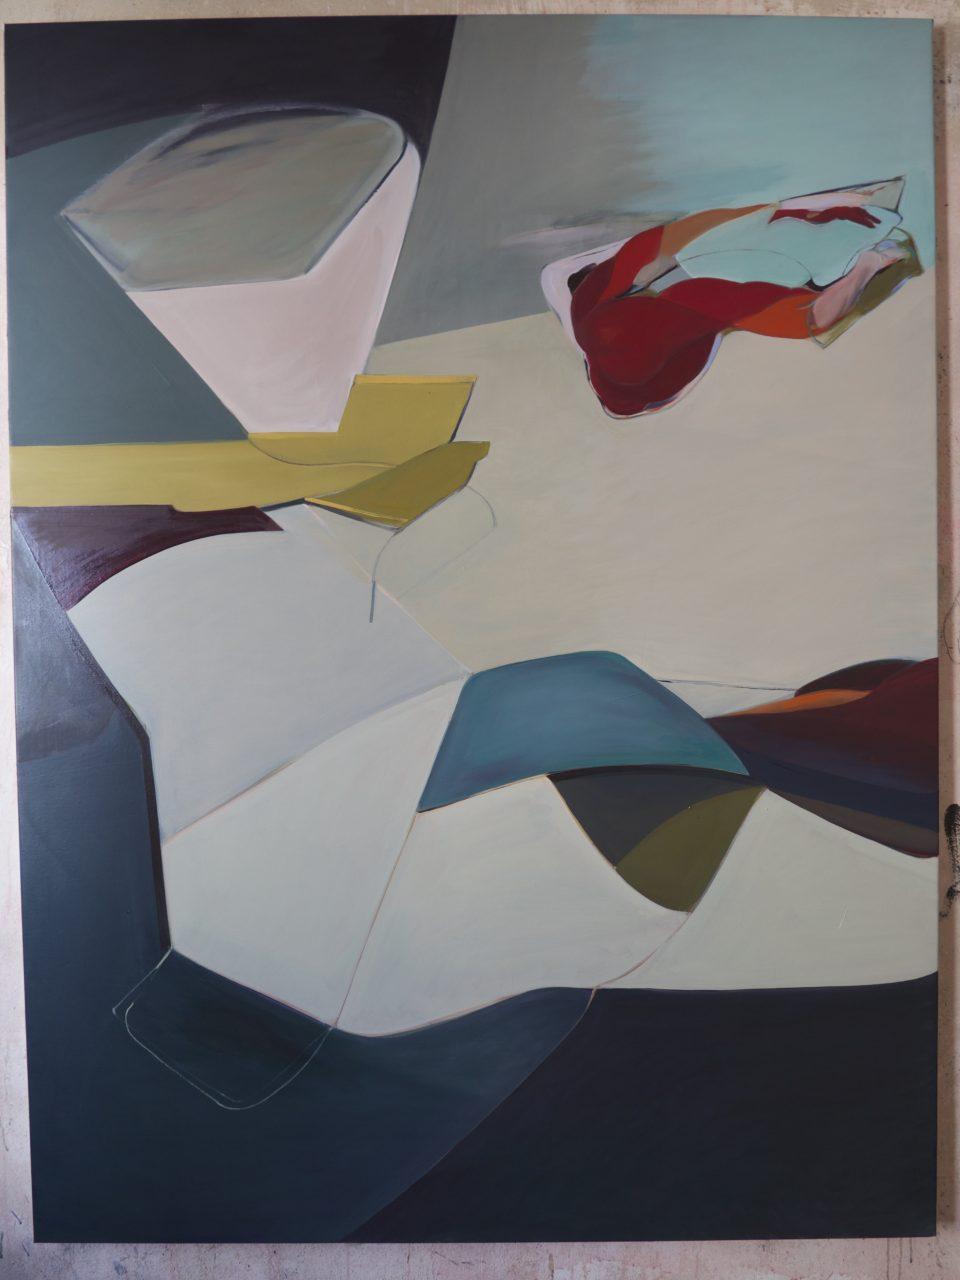 Reflexion , 180 x 140 cm, Oil painting 2017